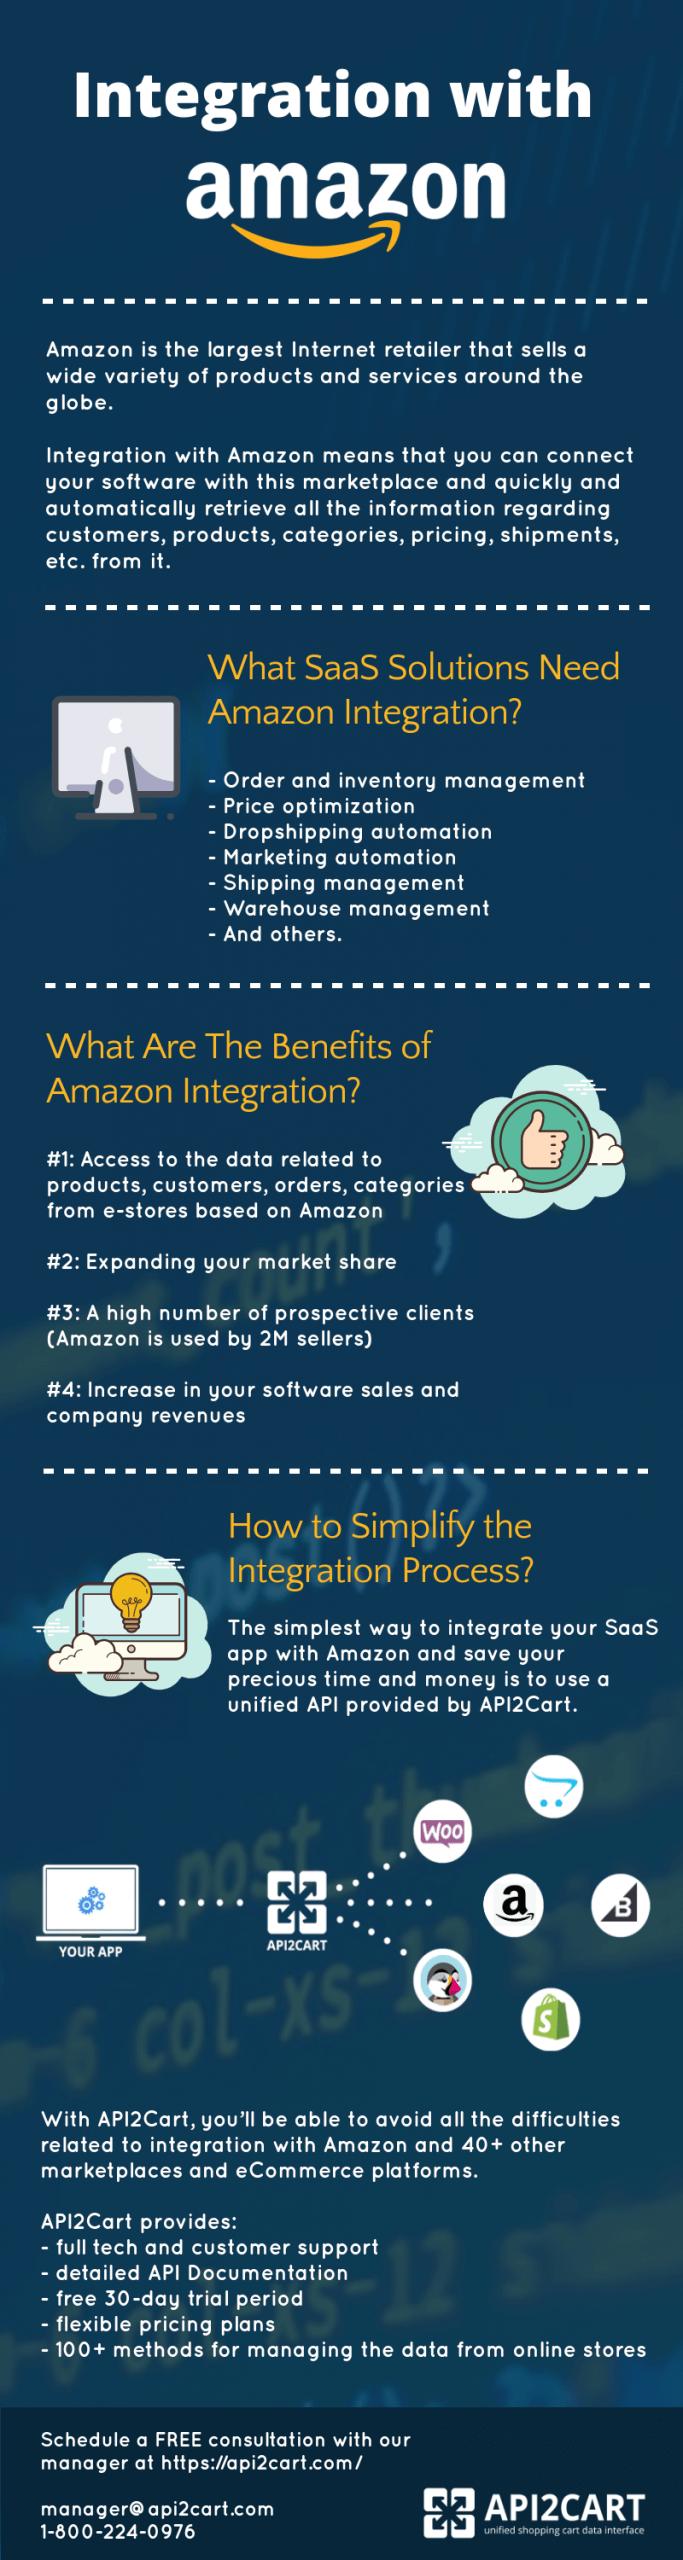 integration with Amazon